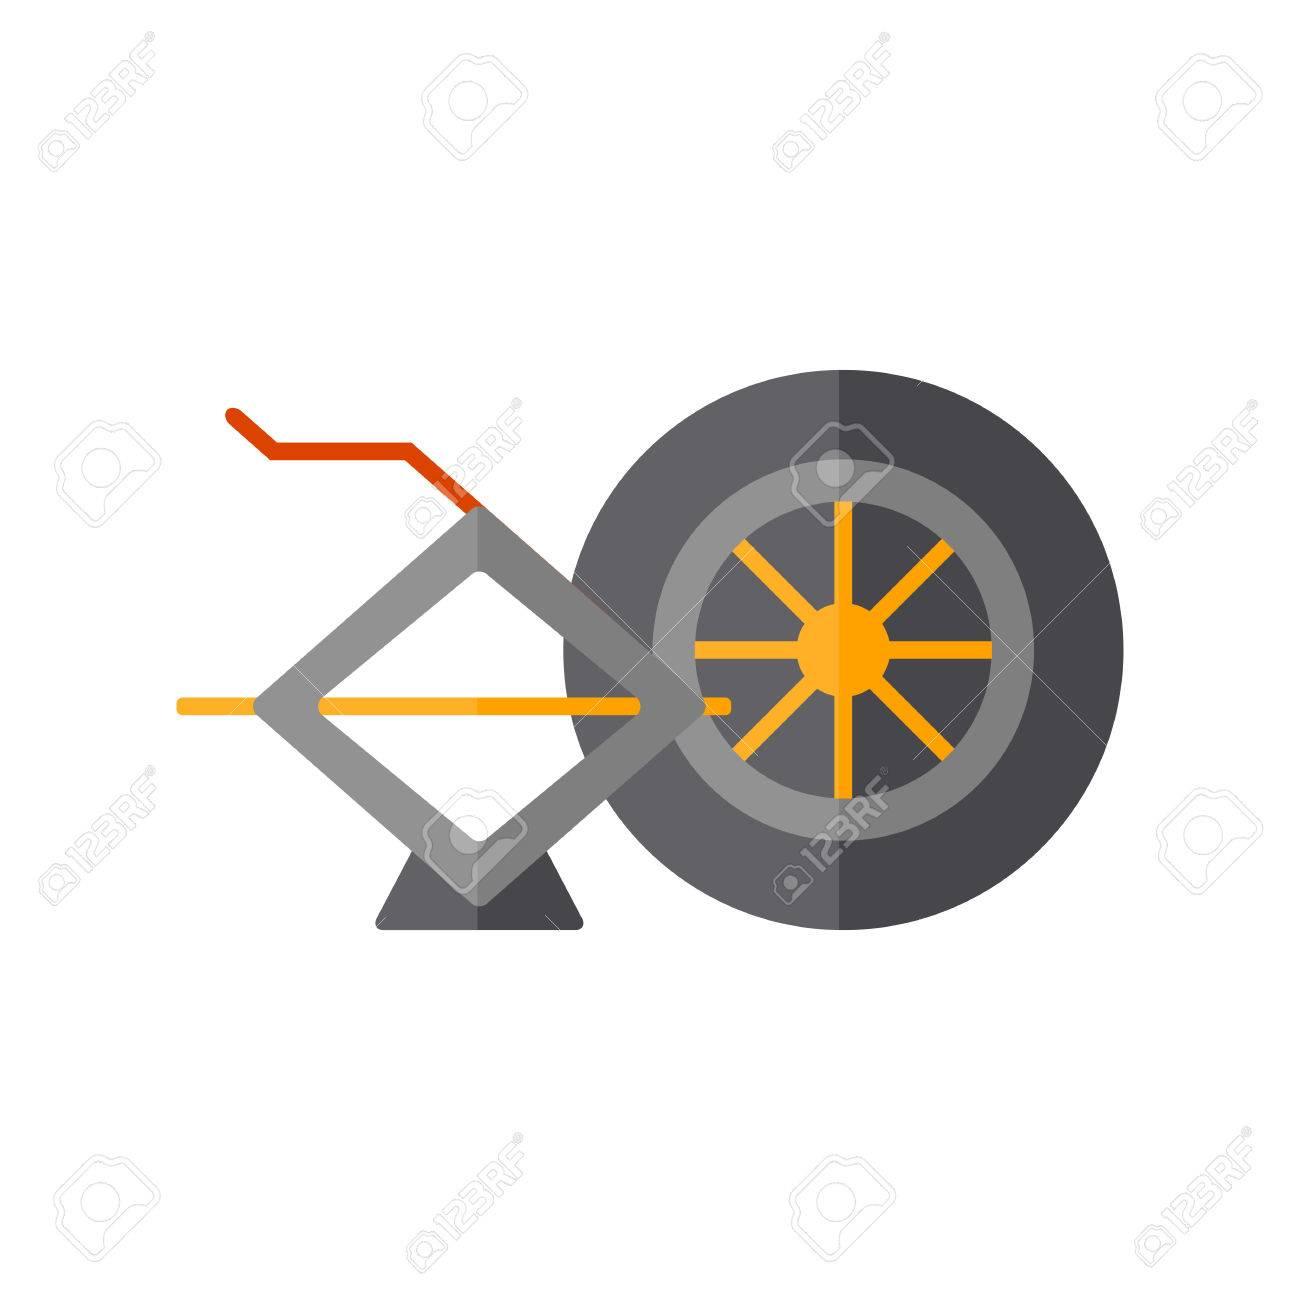 Design of car jack - Vector Car Repair Service Concept Flat Wheel And Car Jack Car For Flat Design Car Repair Concept